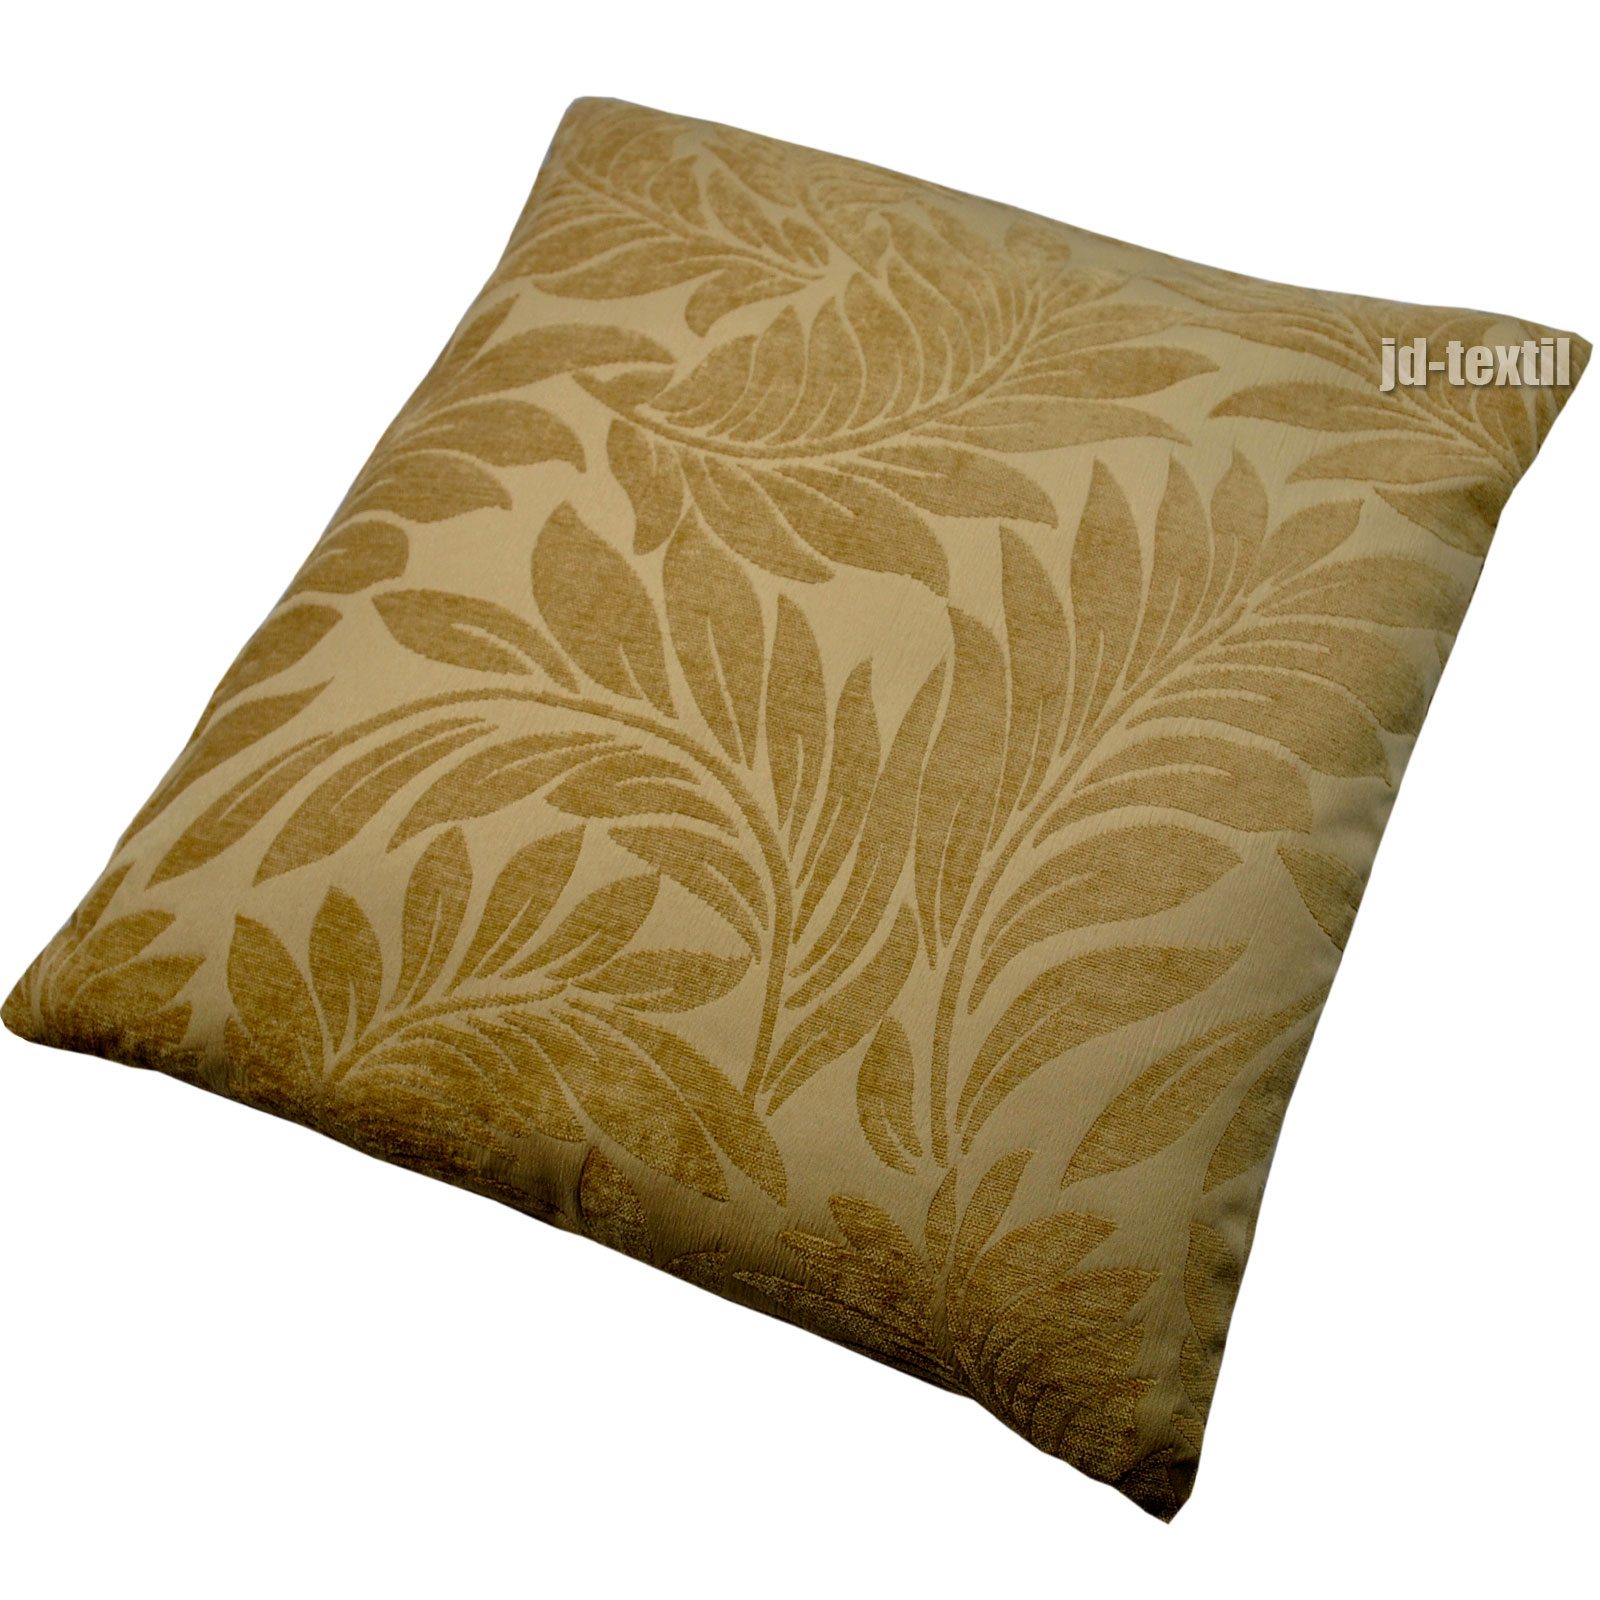 kissenh lle cord optik sofa sessel kissenbezug 40x40 50x50 40x60 cm kord bez ge ebay. Black Bedroom Furniture Sets. Home Design Ideas